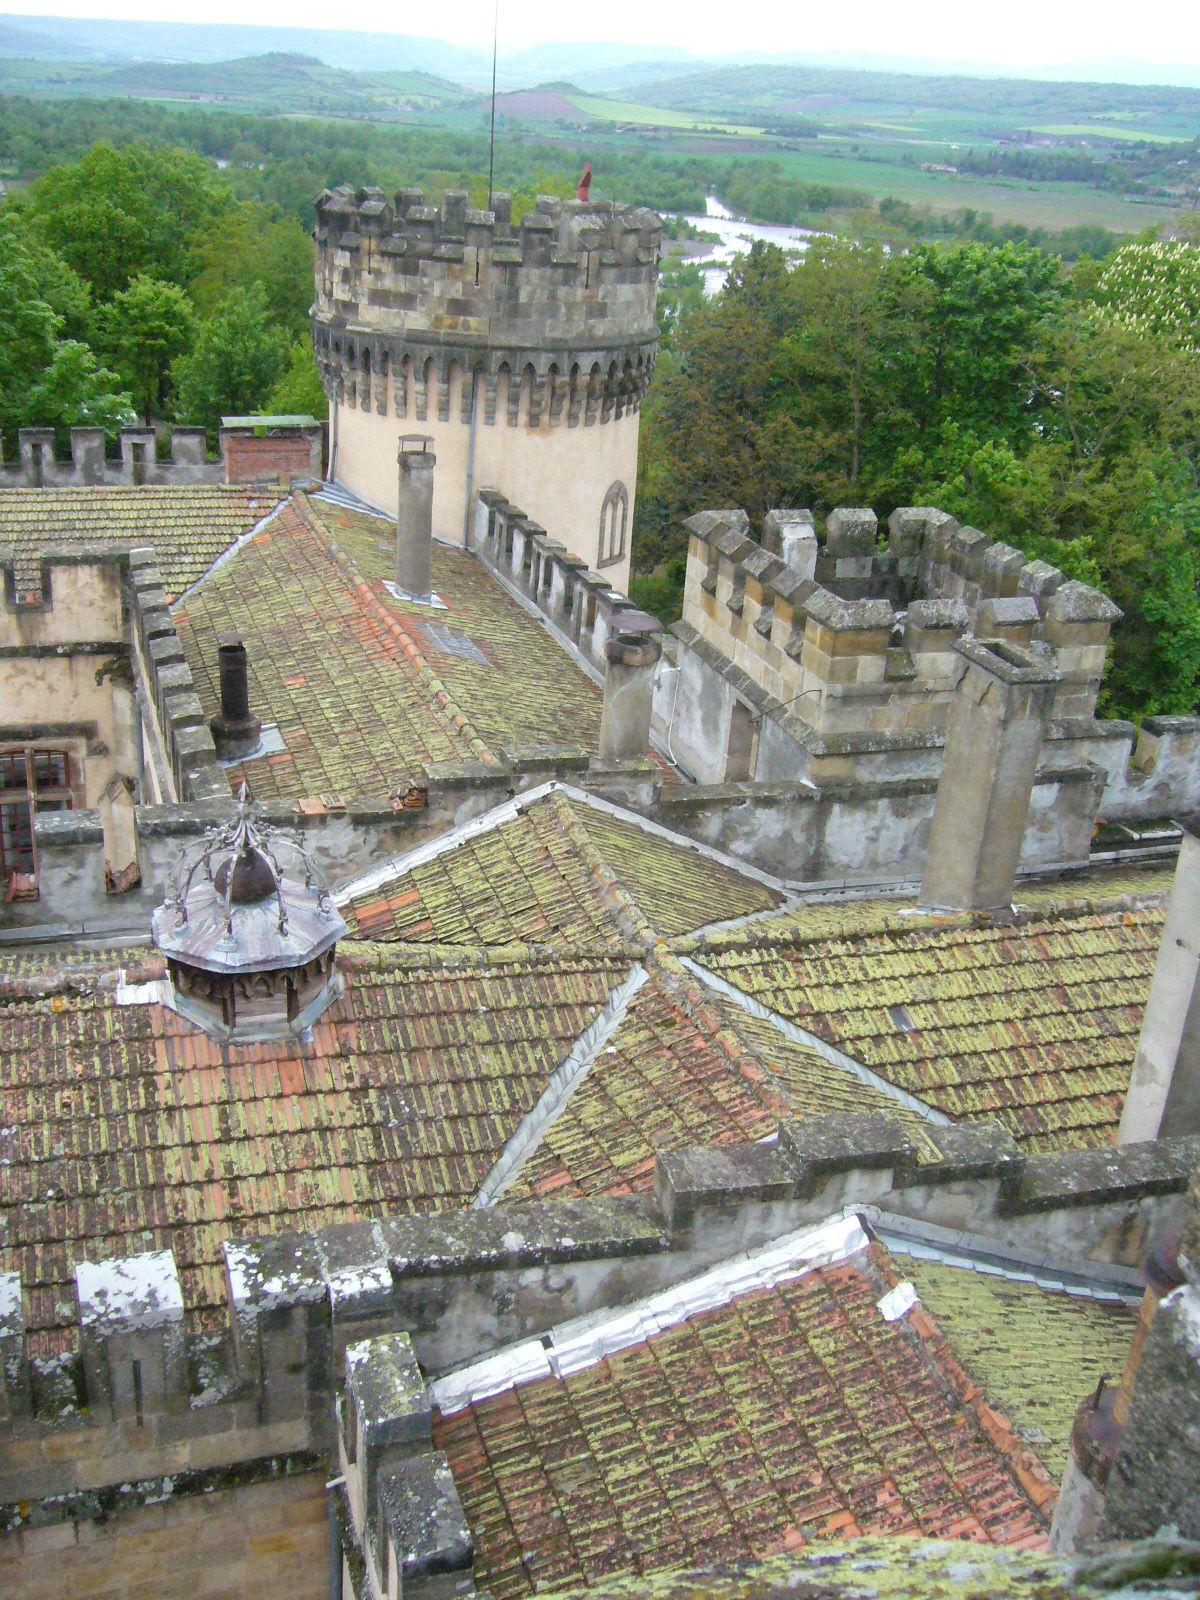 Grange Fort Castle - Wikipedia